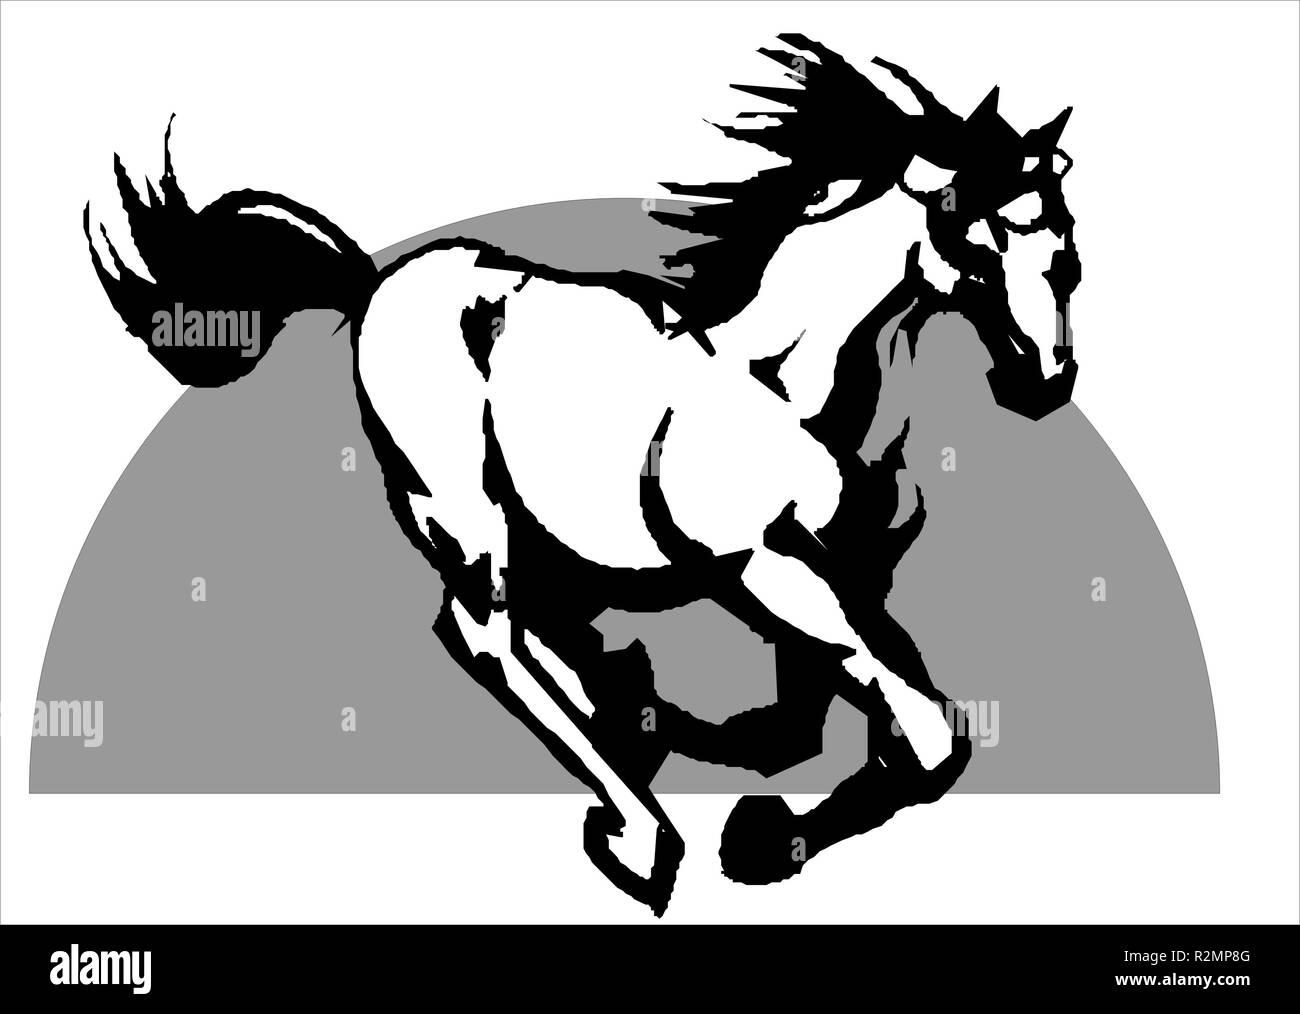 horse 03 Stock Photo